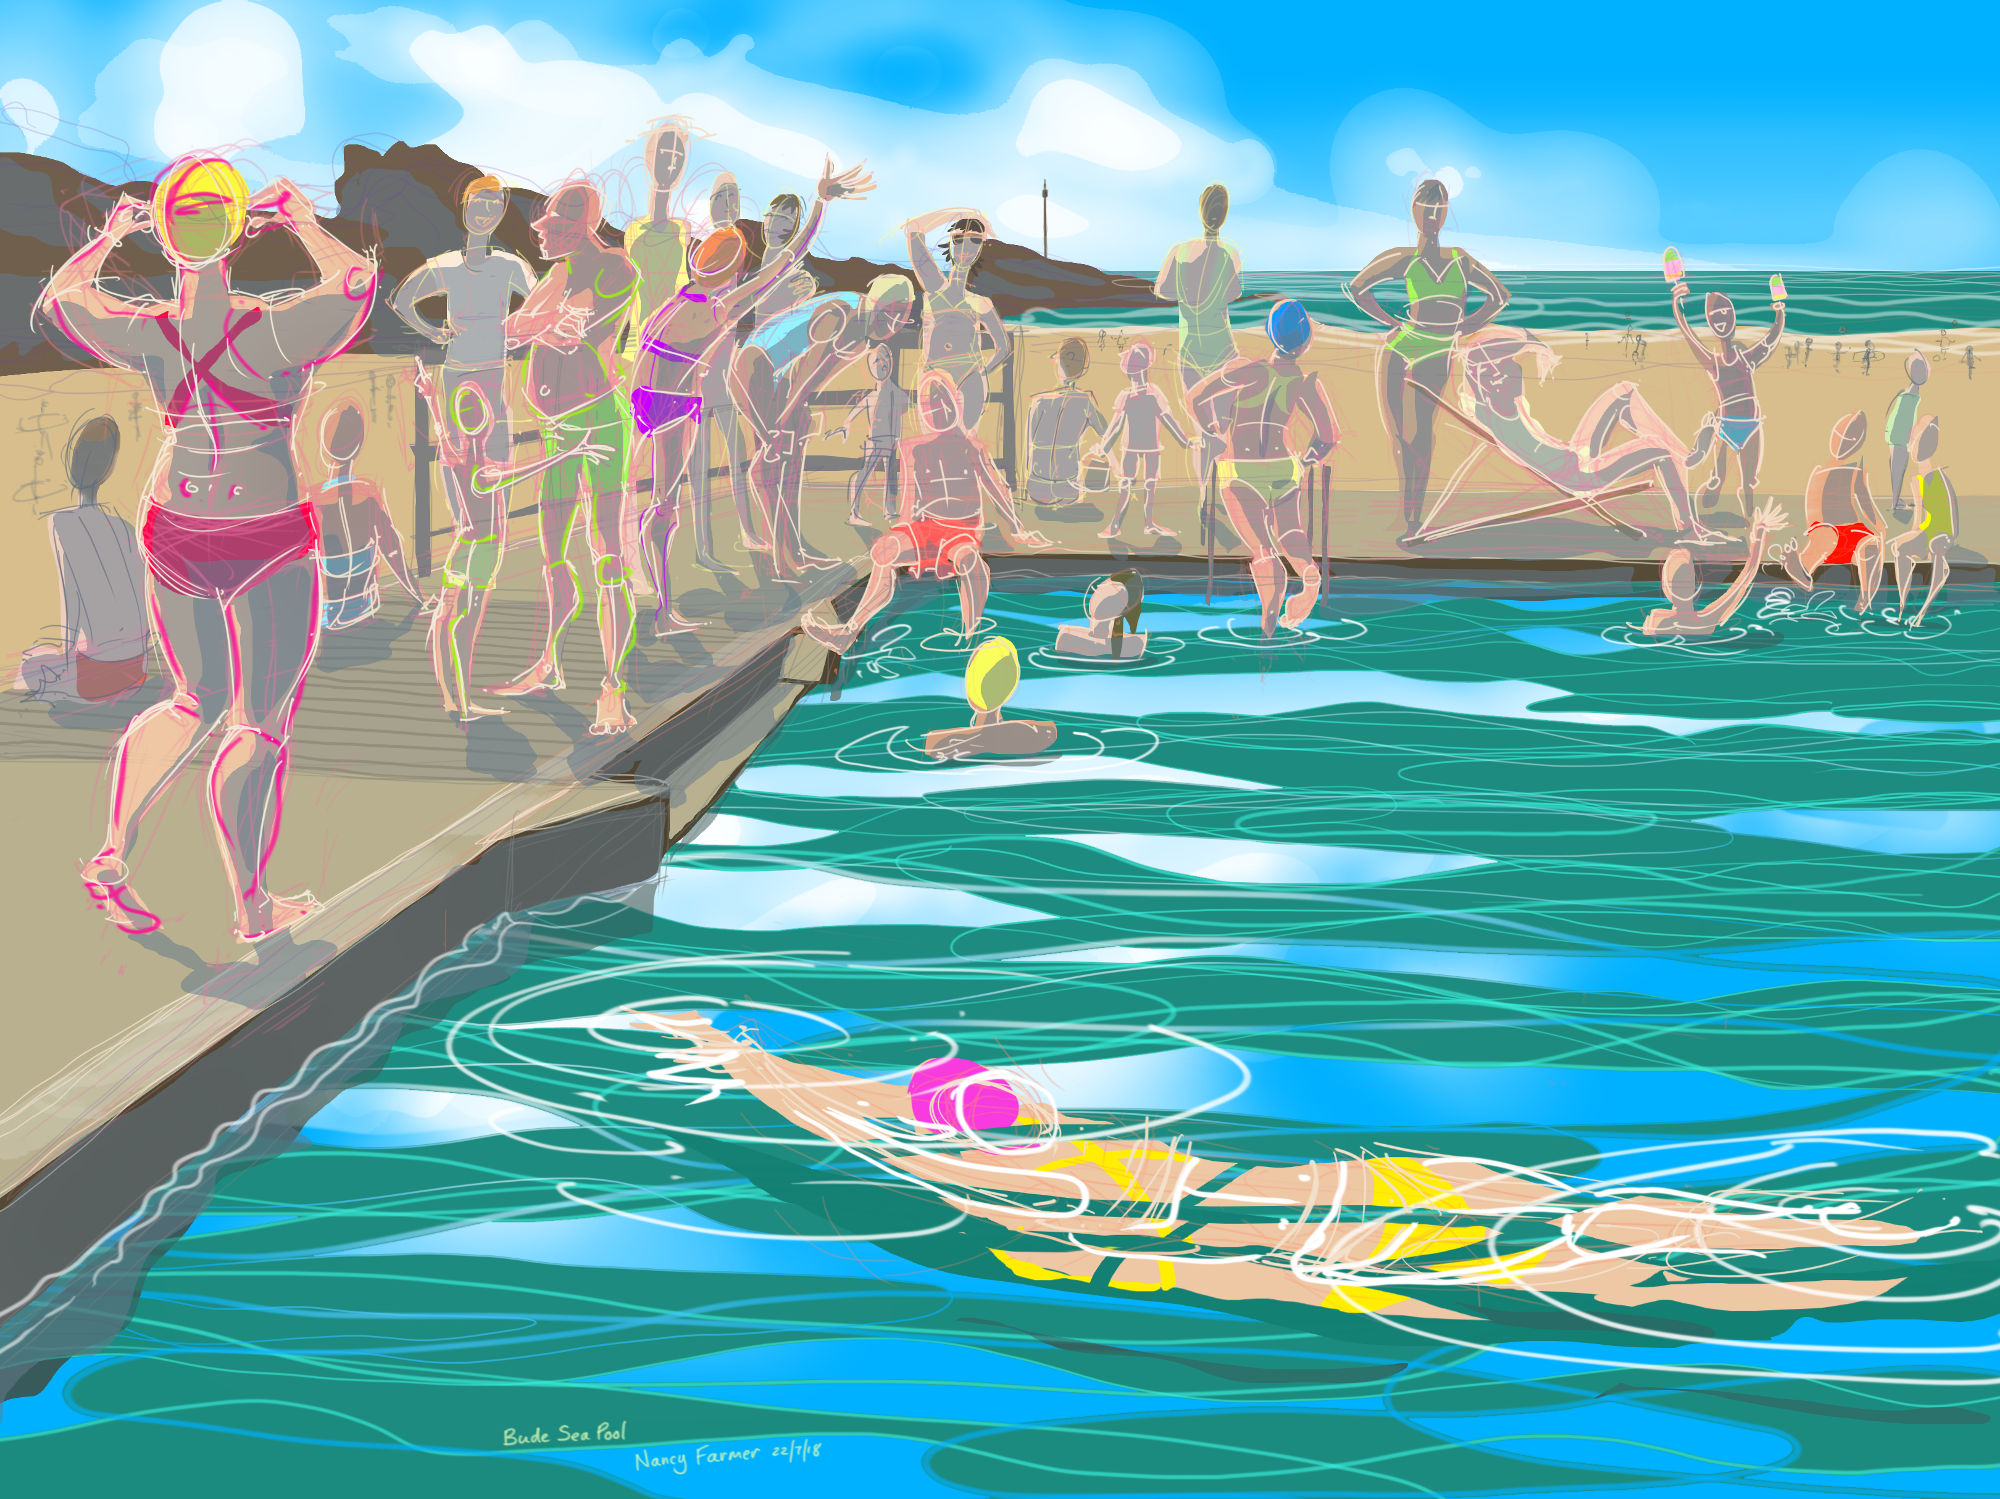 Bude Sea Pool in the Summer - Digital drawing by Nancy Farmer